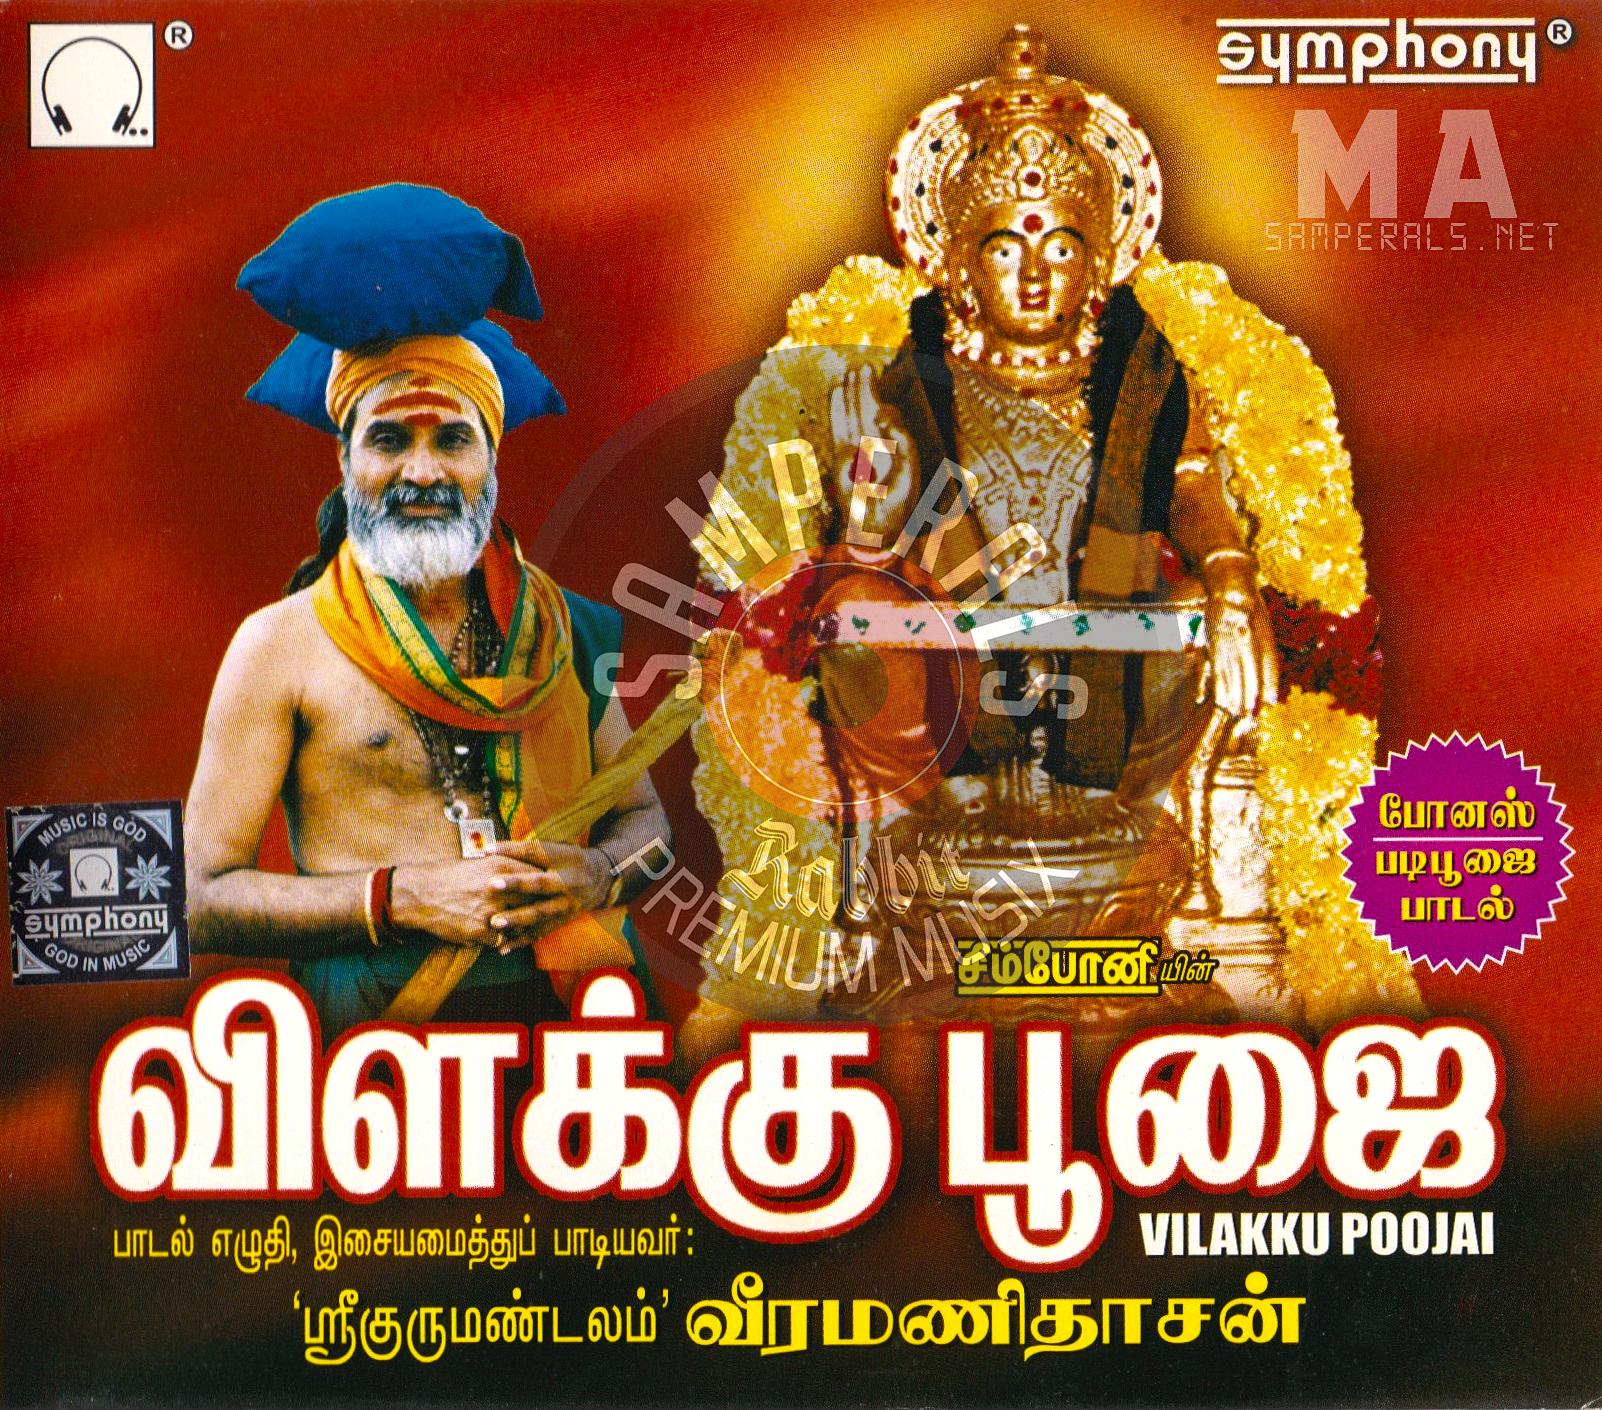 Vilakku Poojai Ayyappan Songs 2019 Download Veeramanidassan Ayyappan Songs Download Srihari Ayyappan Songs Download Ta Symphony Devotions Movie Posters